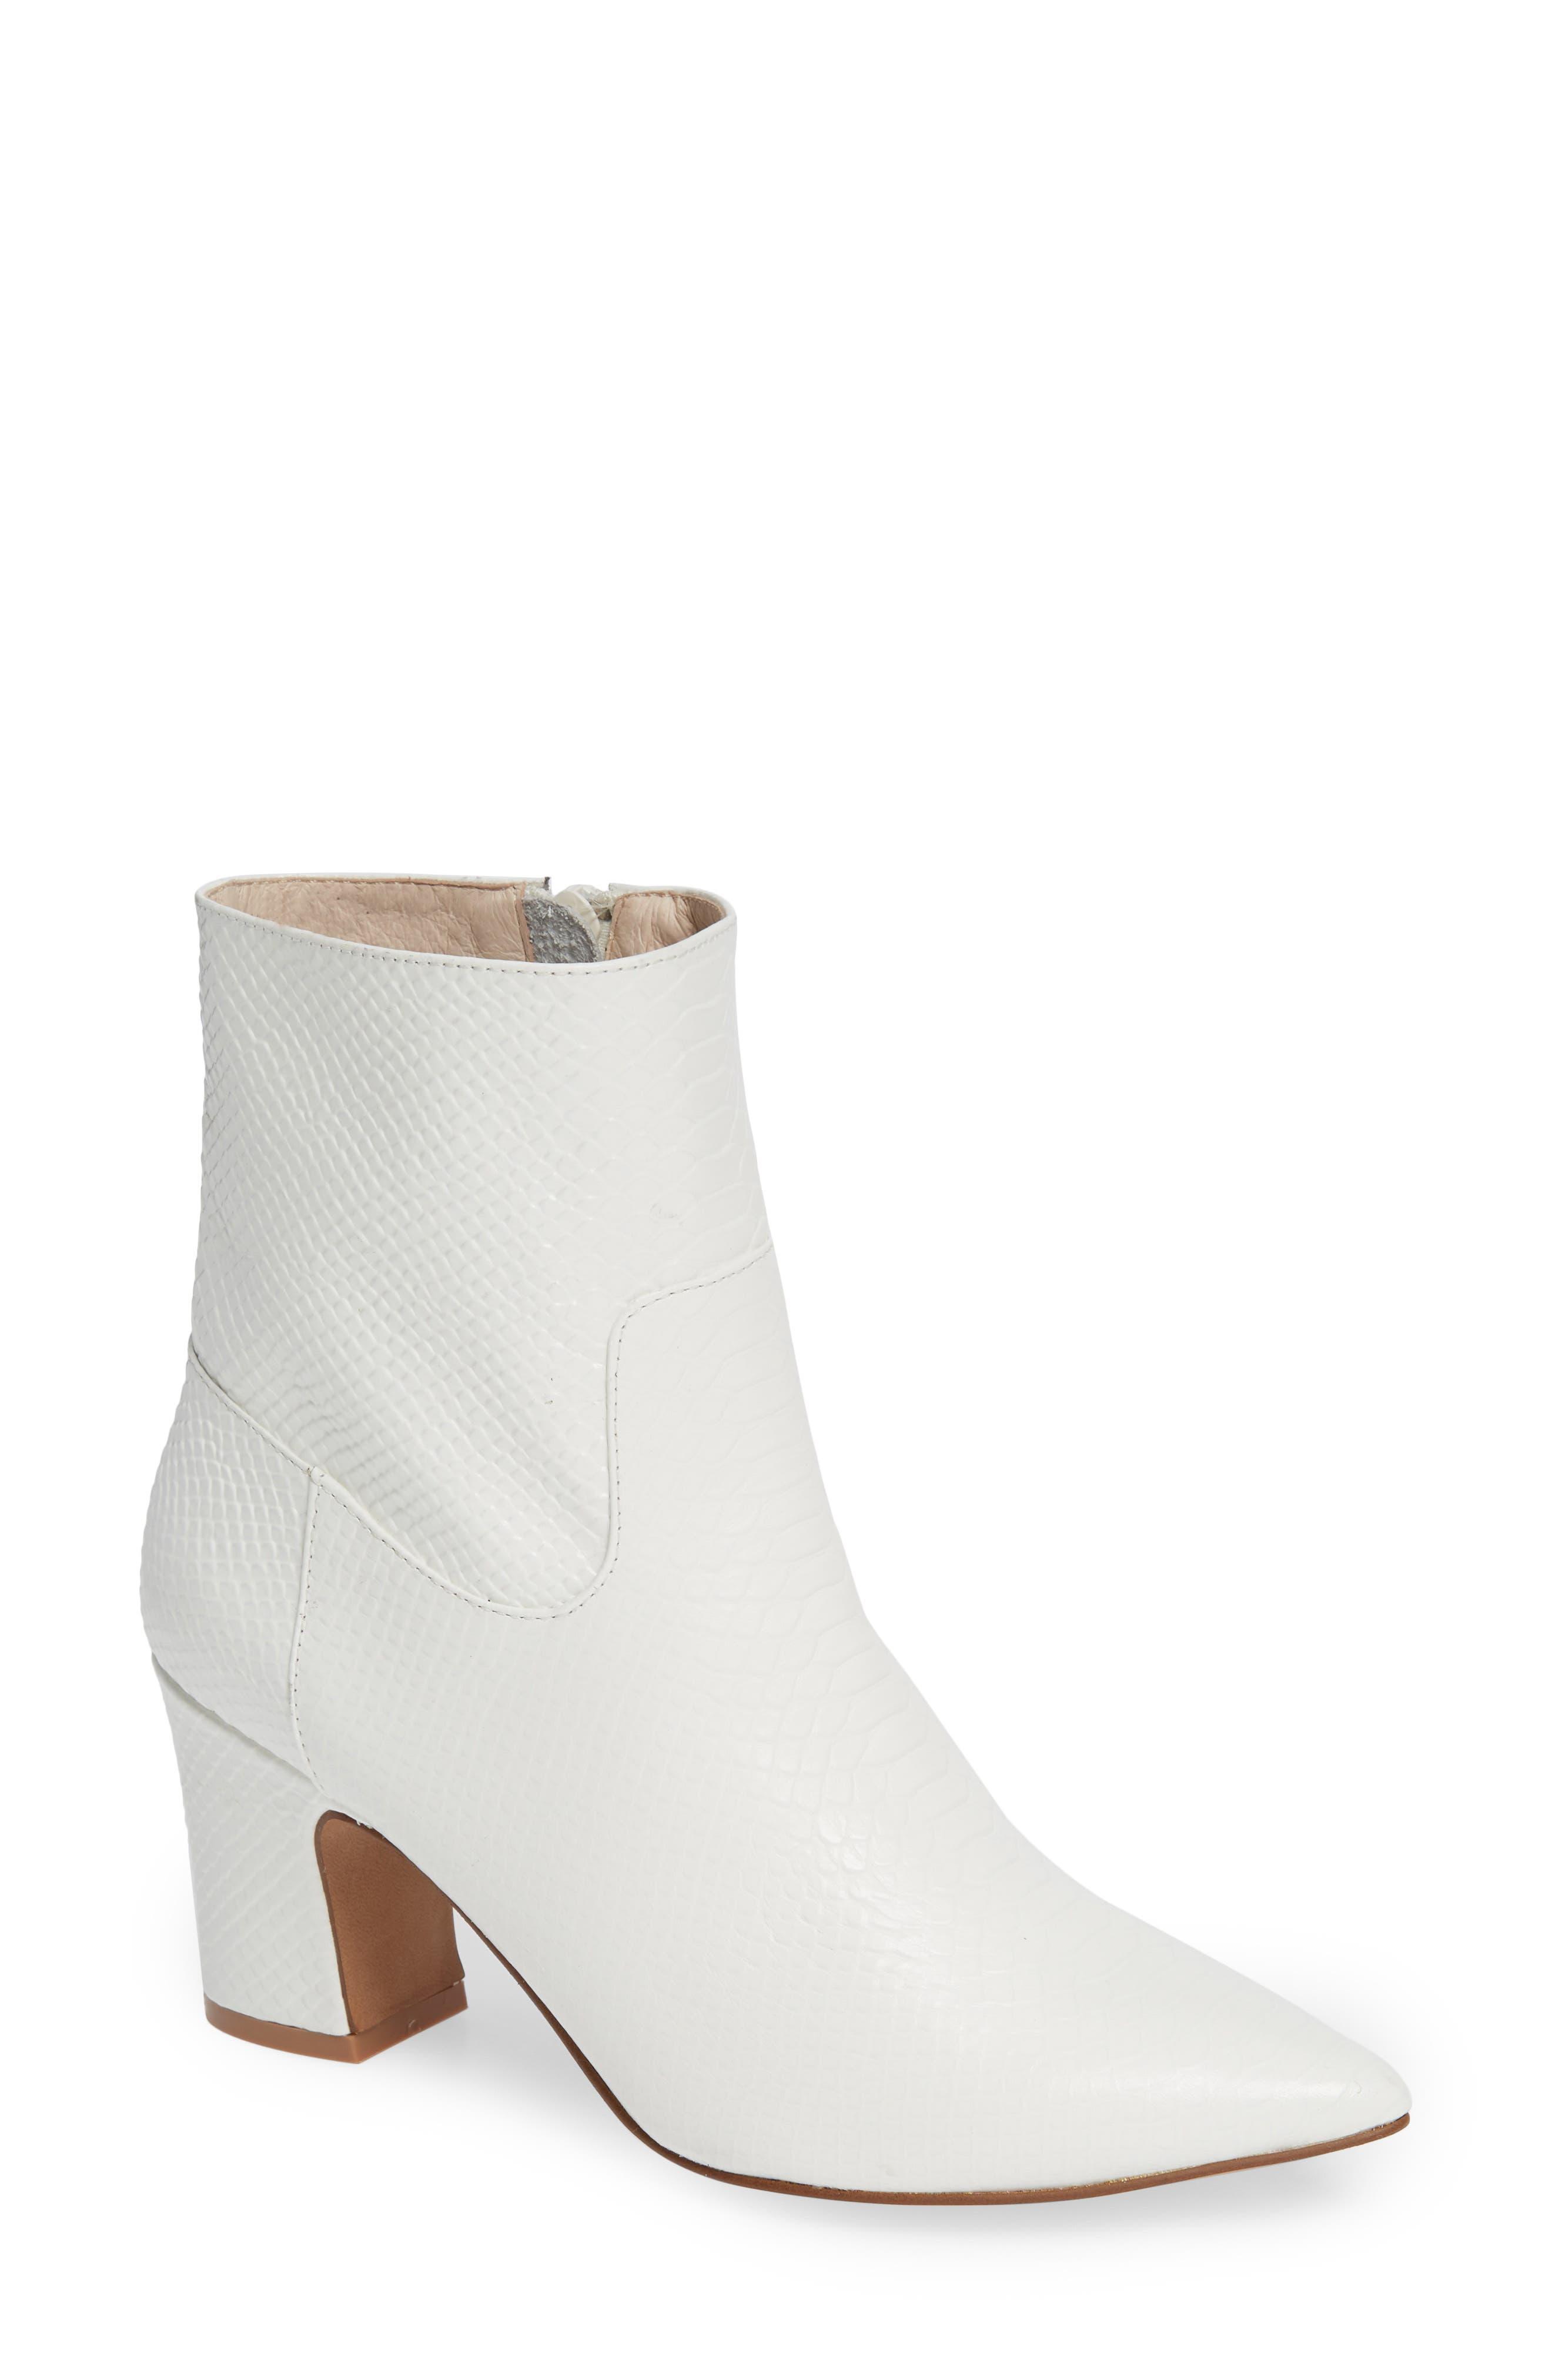 Damens's Weiß Booties & Nordstrom Ankle Stiefel   Nordstrom & 88dc08